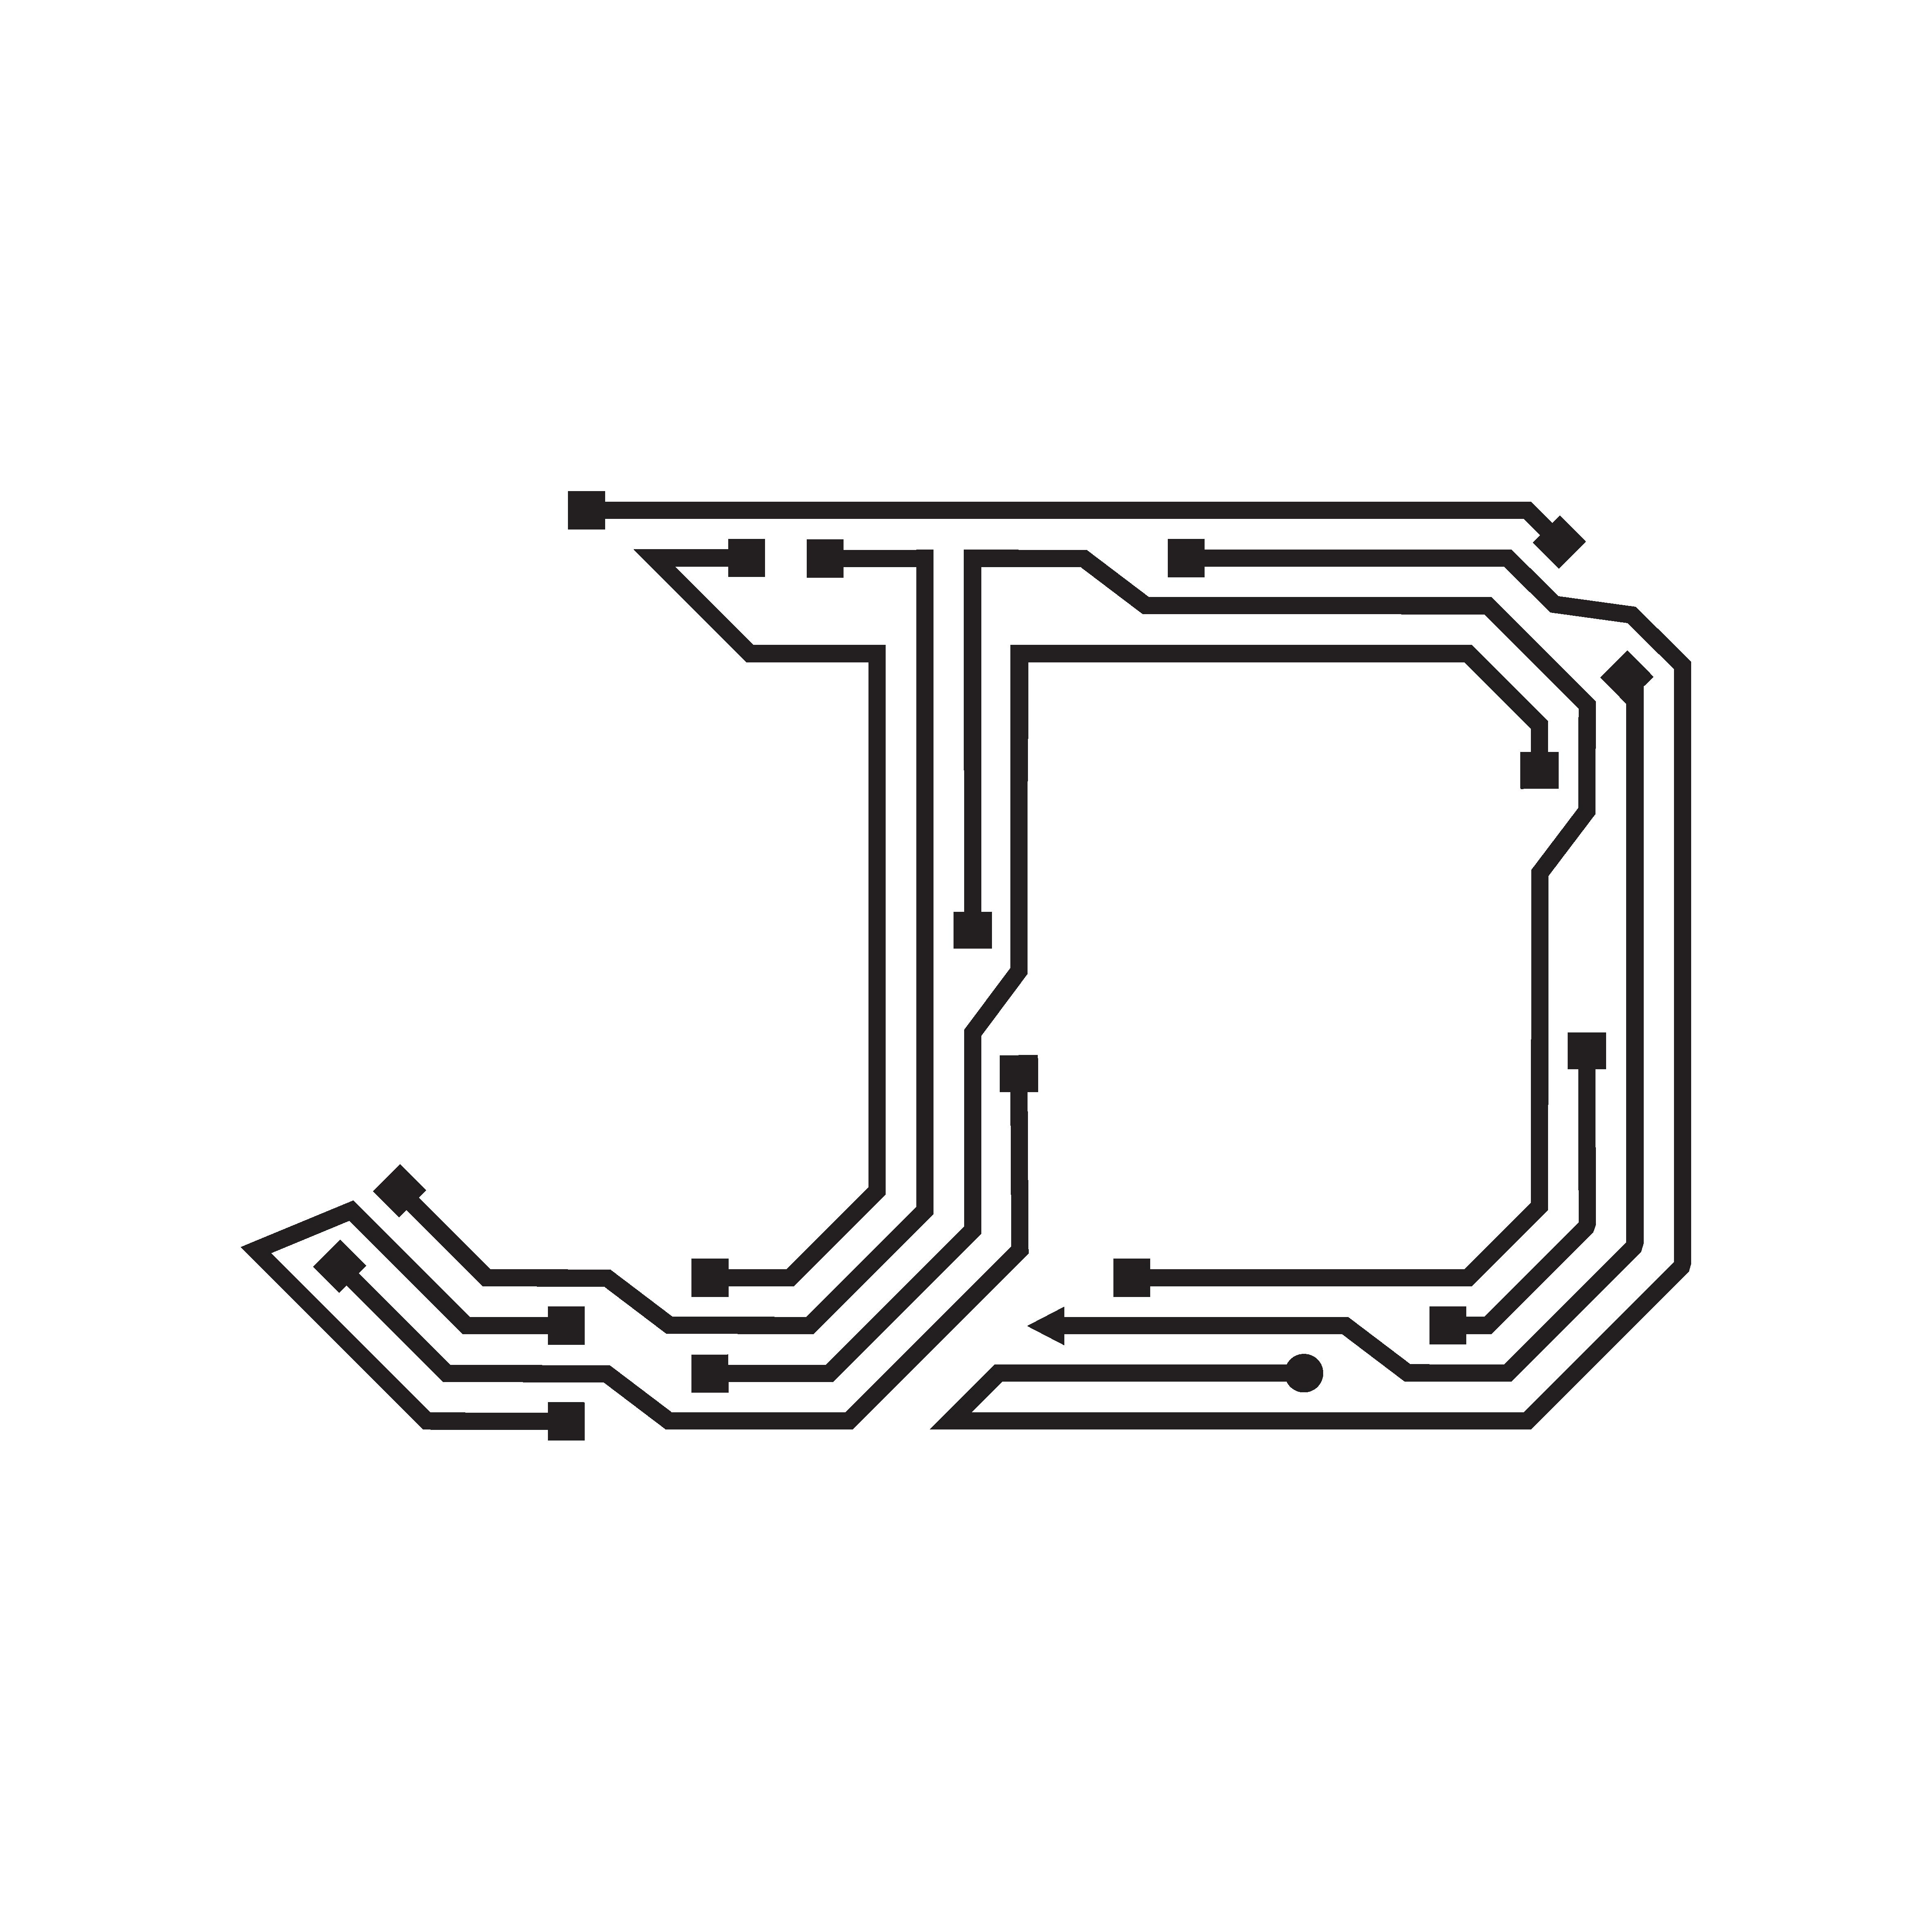 JDubb's Tech Reviews